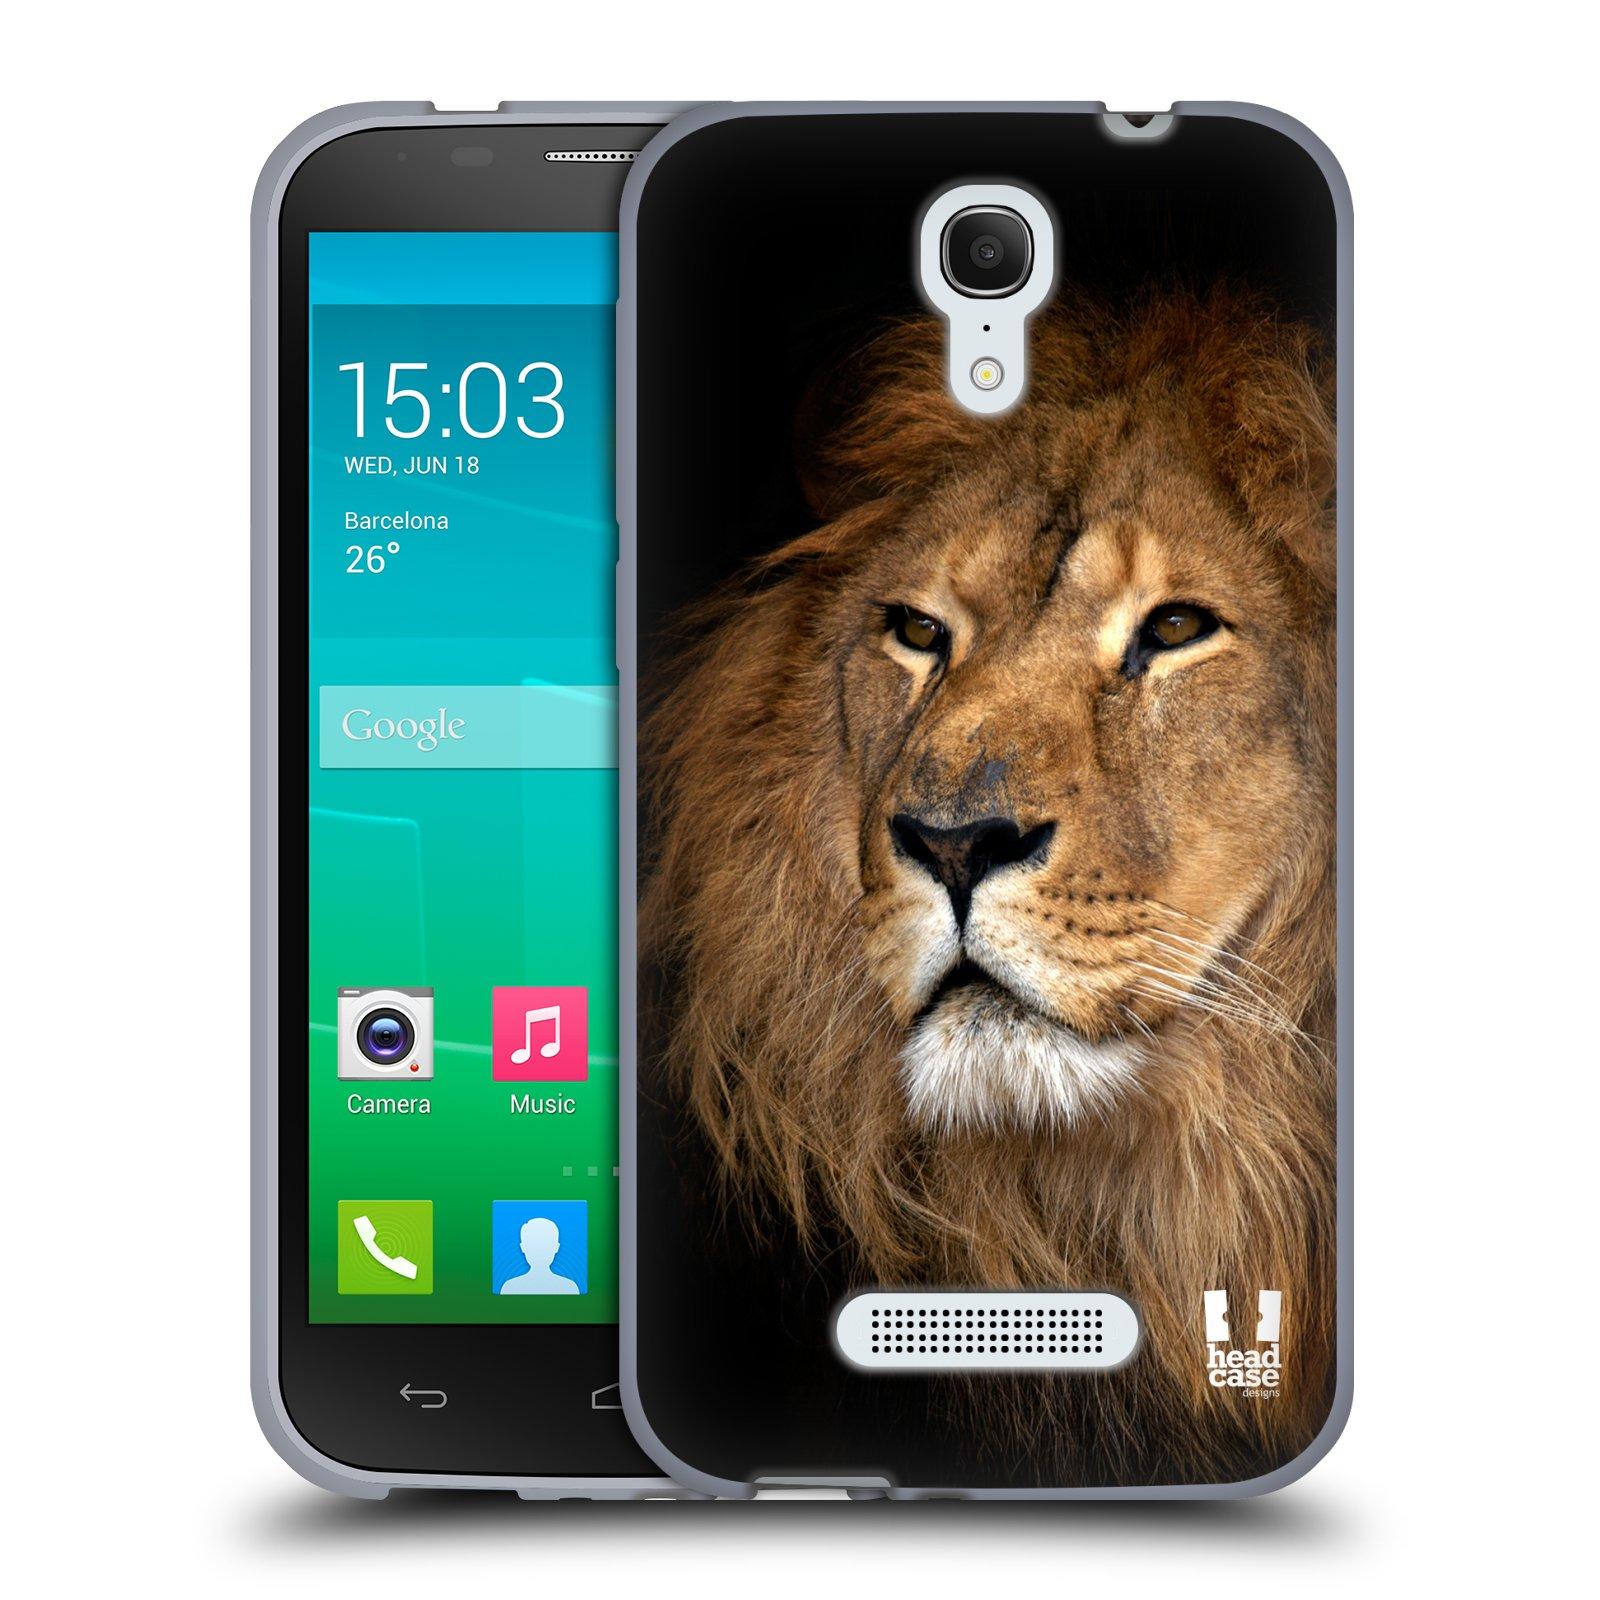 HEAD CASE silikonový obal na mobil Alcatel POP S7 vzor Divočina, Divoký život a zvířata foto LEV KRÁL ZVÍŘAT